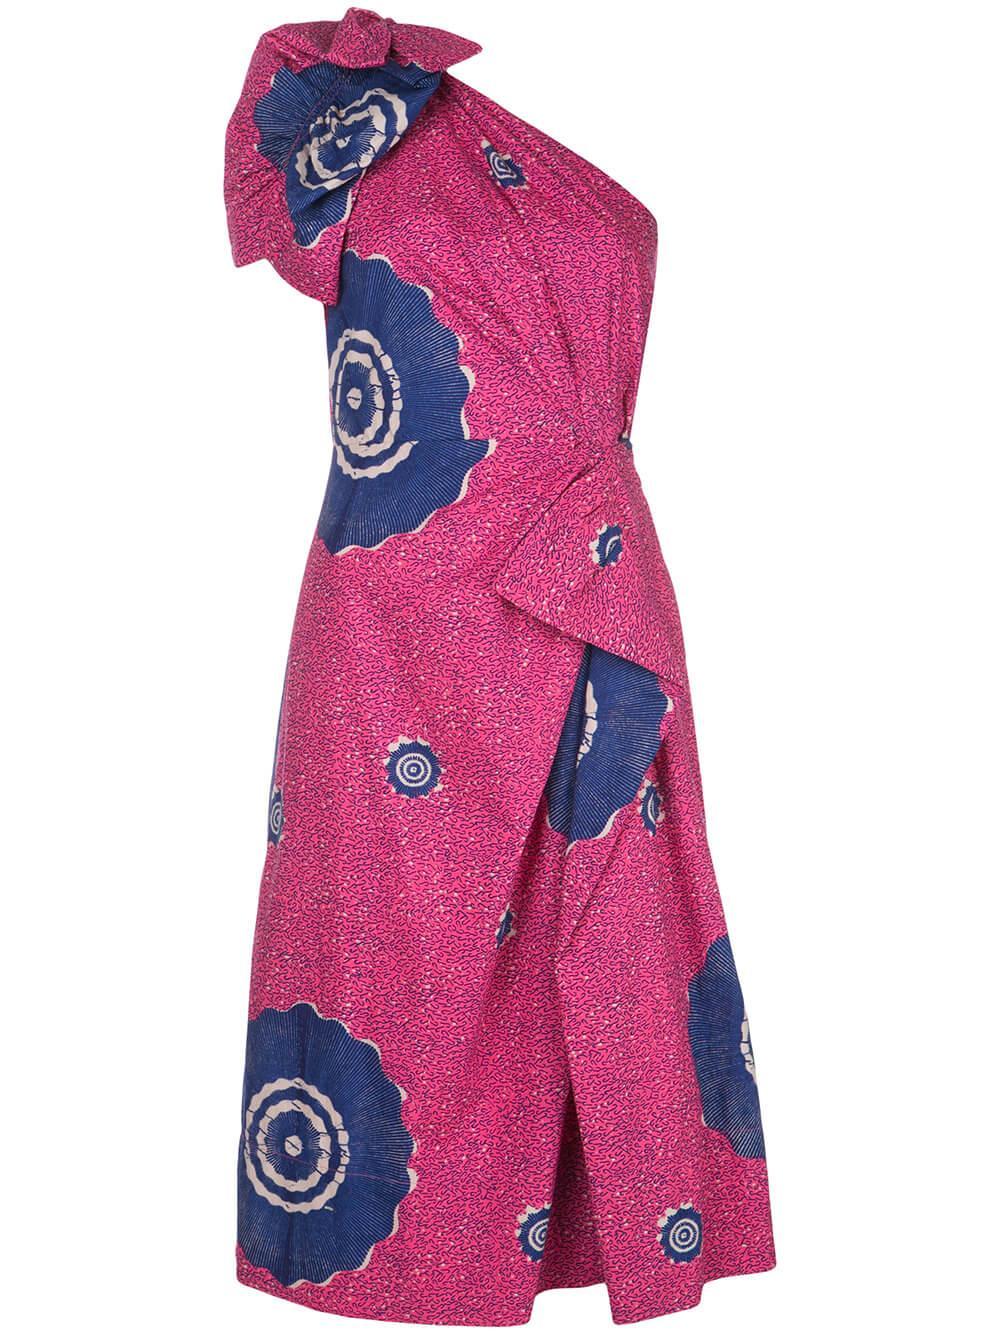 Idra One Shoulder Cotton Printed Dress